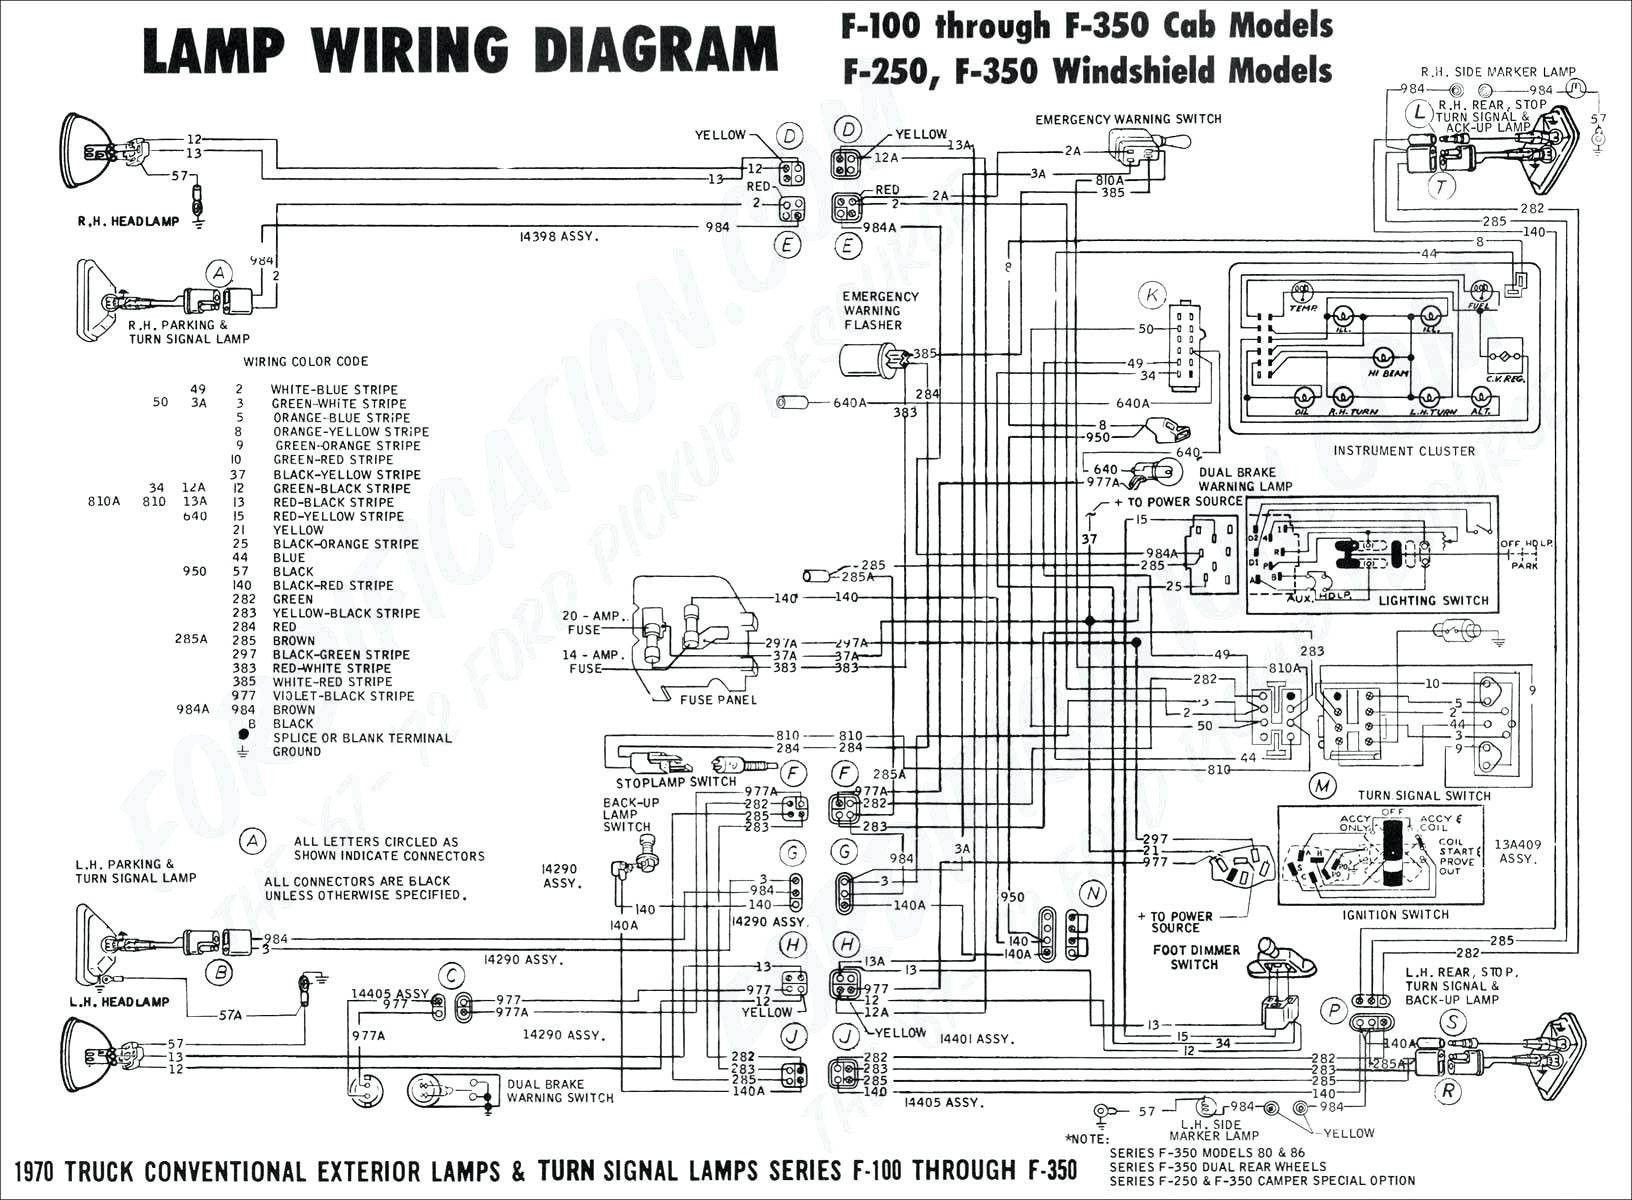 [SCHEMATICS_4JK]  Unique 2003 Buick Rendezvous Radio Wiring Diagram in 2020 | Electrical  wiring diagram, Diagram, Trailer wiring diagram | Buick Rendezvous Trailer Wiring Diagram |  | Pinterest